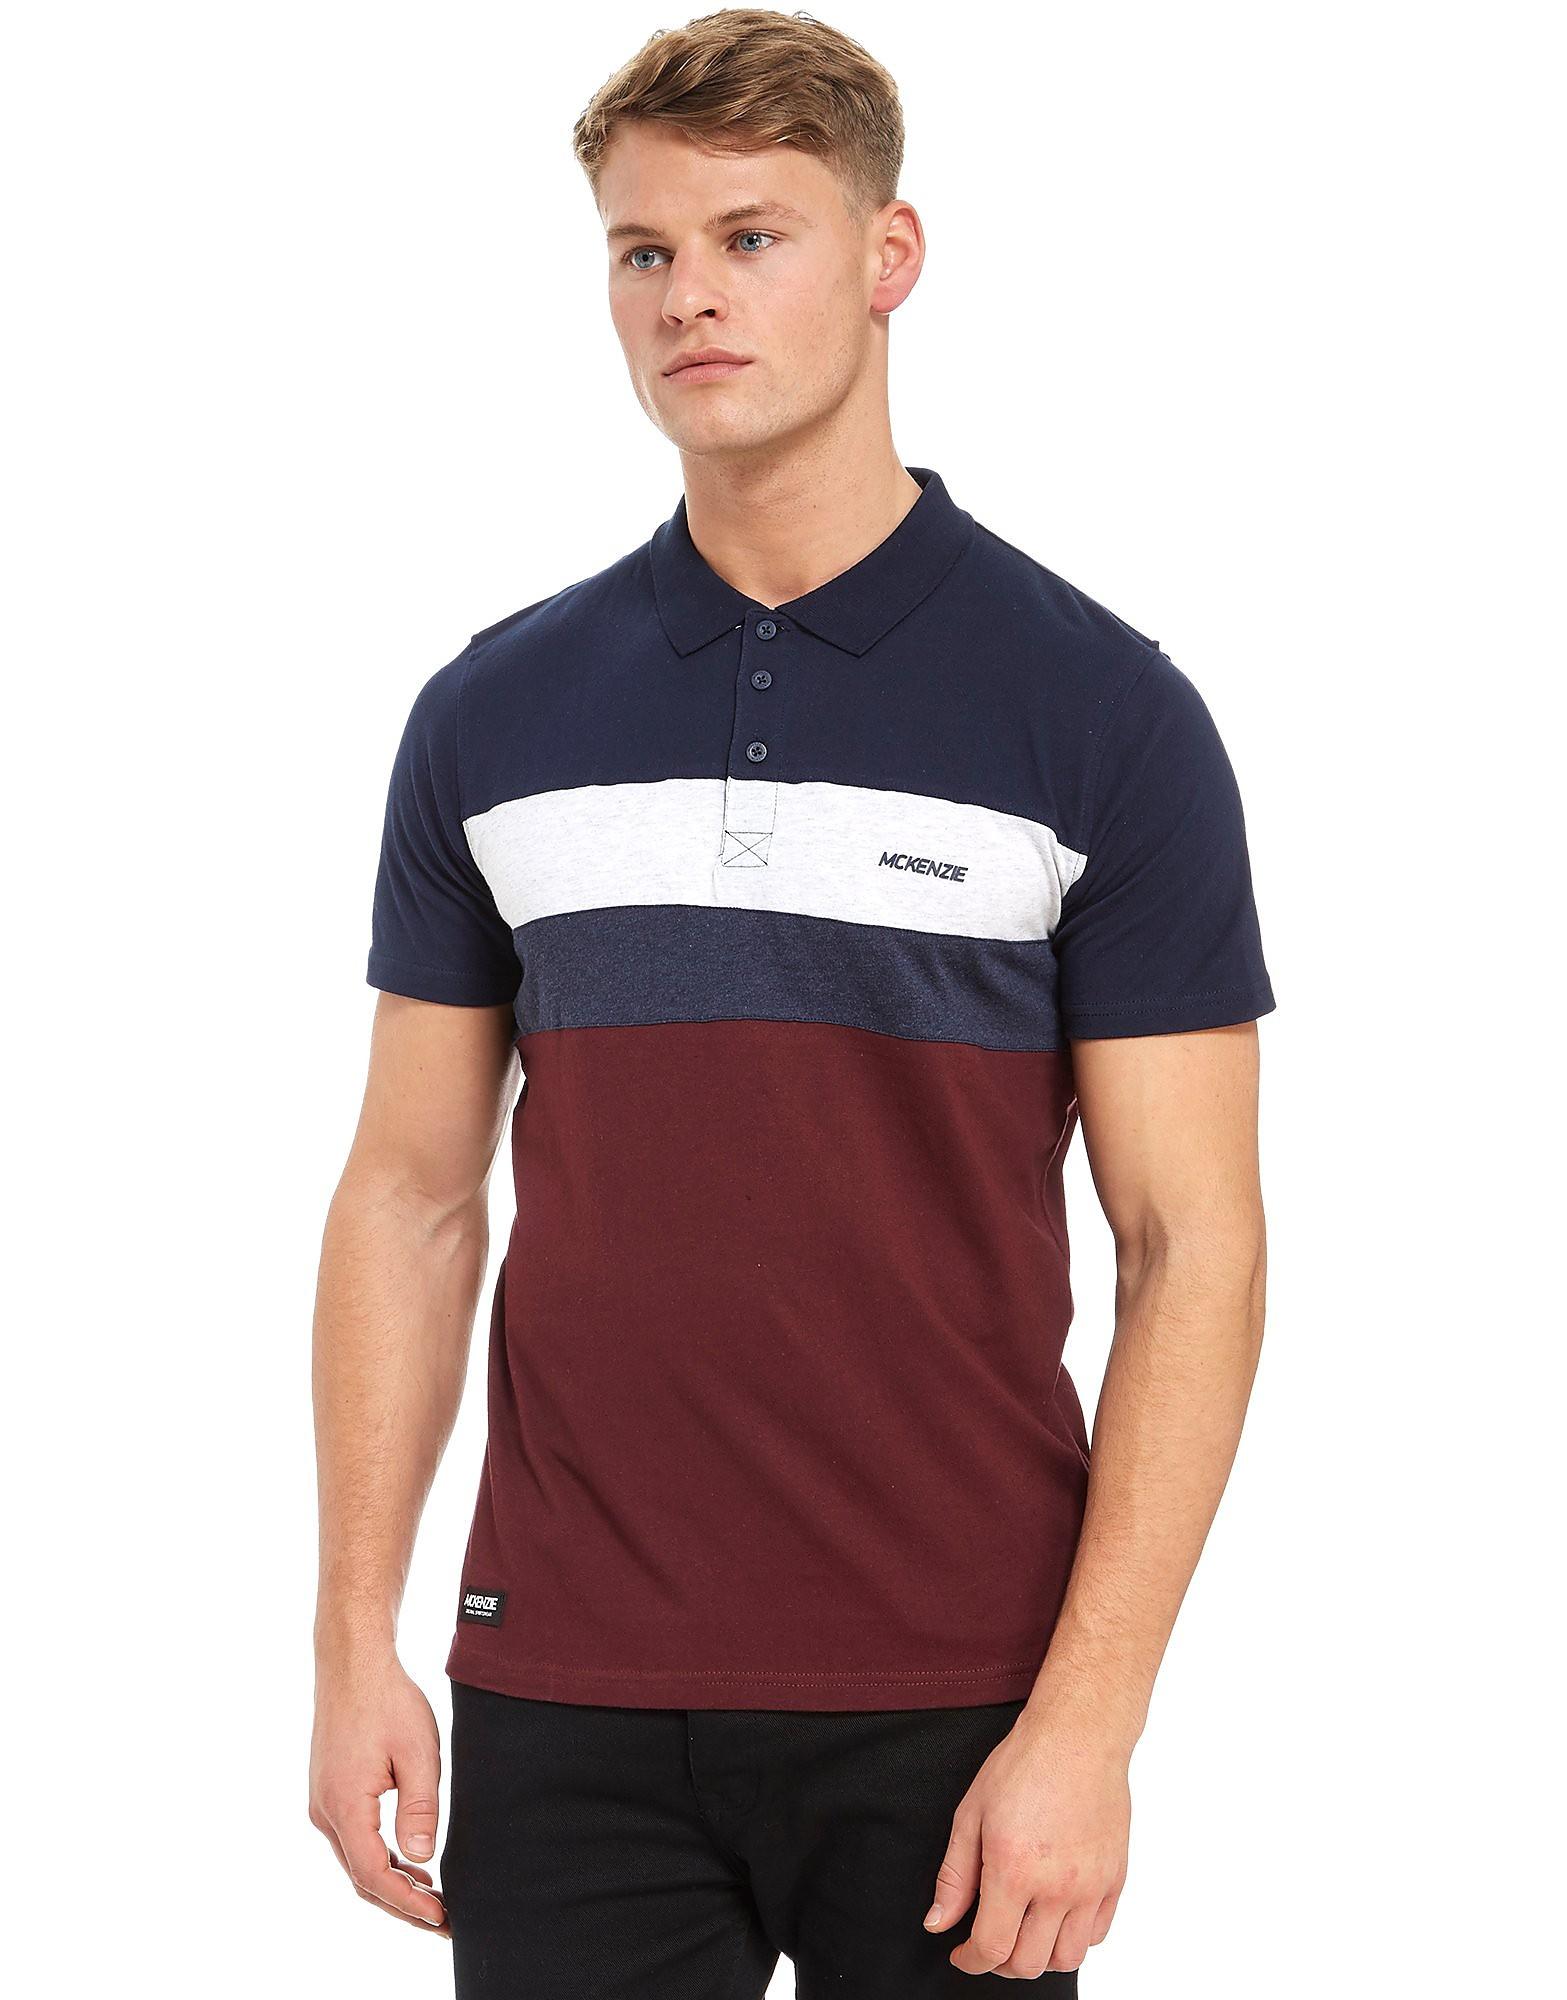 McKenzie Seti Polo Shirt